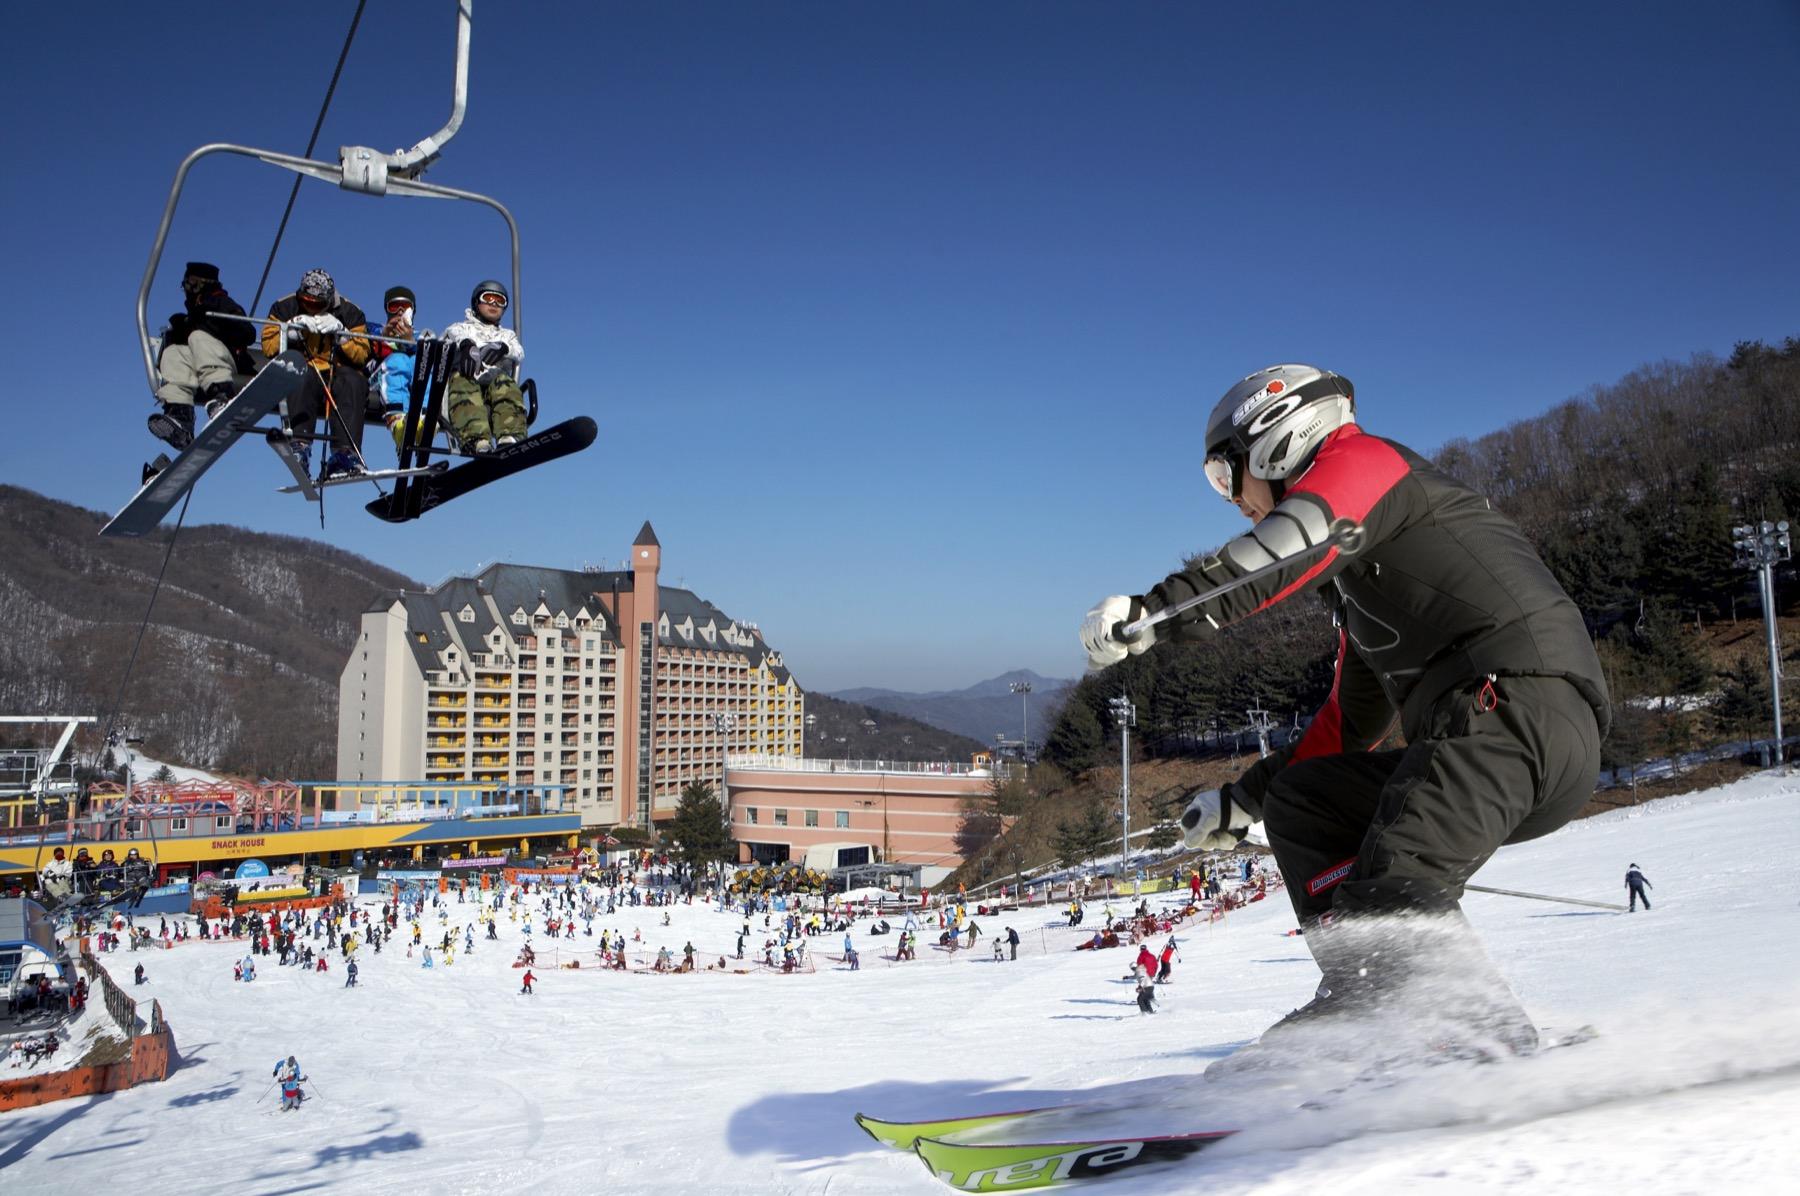 day tour from seoul korea s yangji pine ski resort kkday